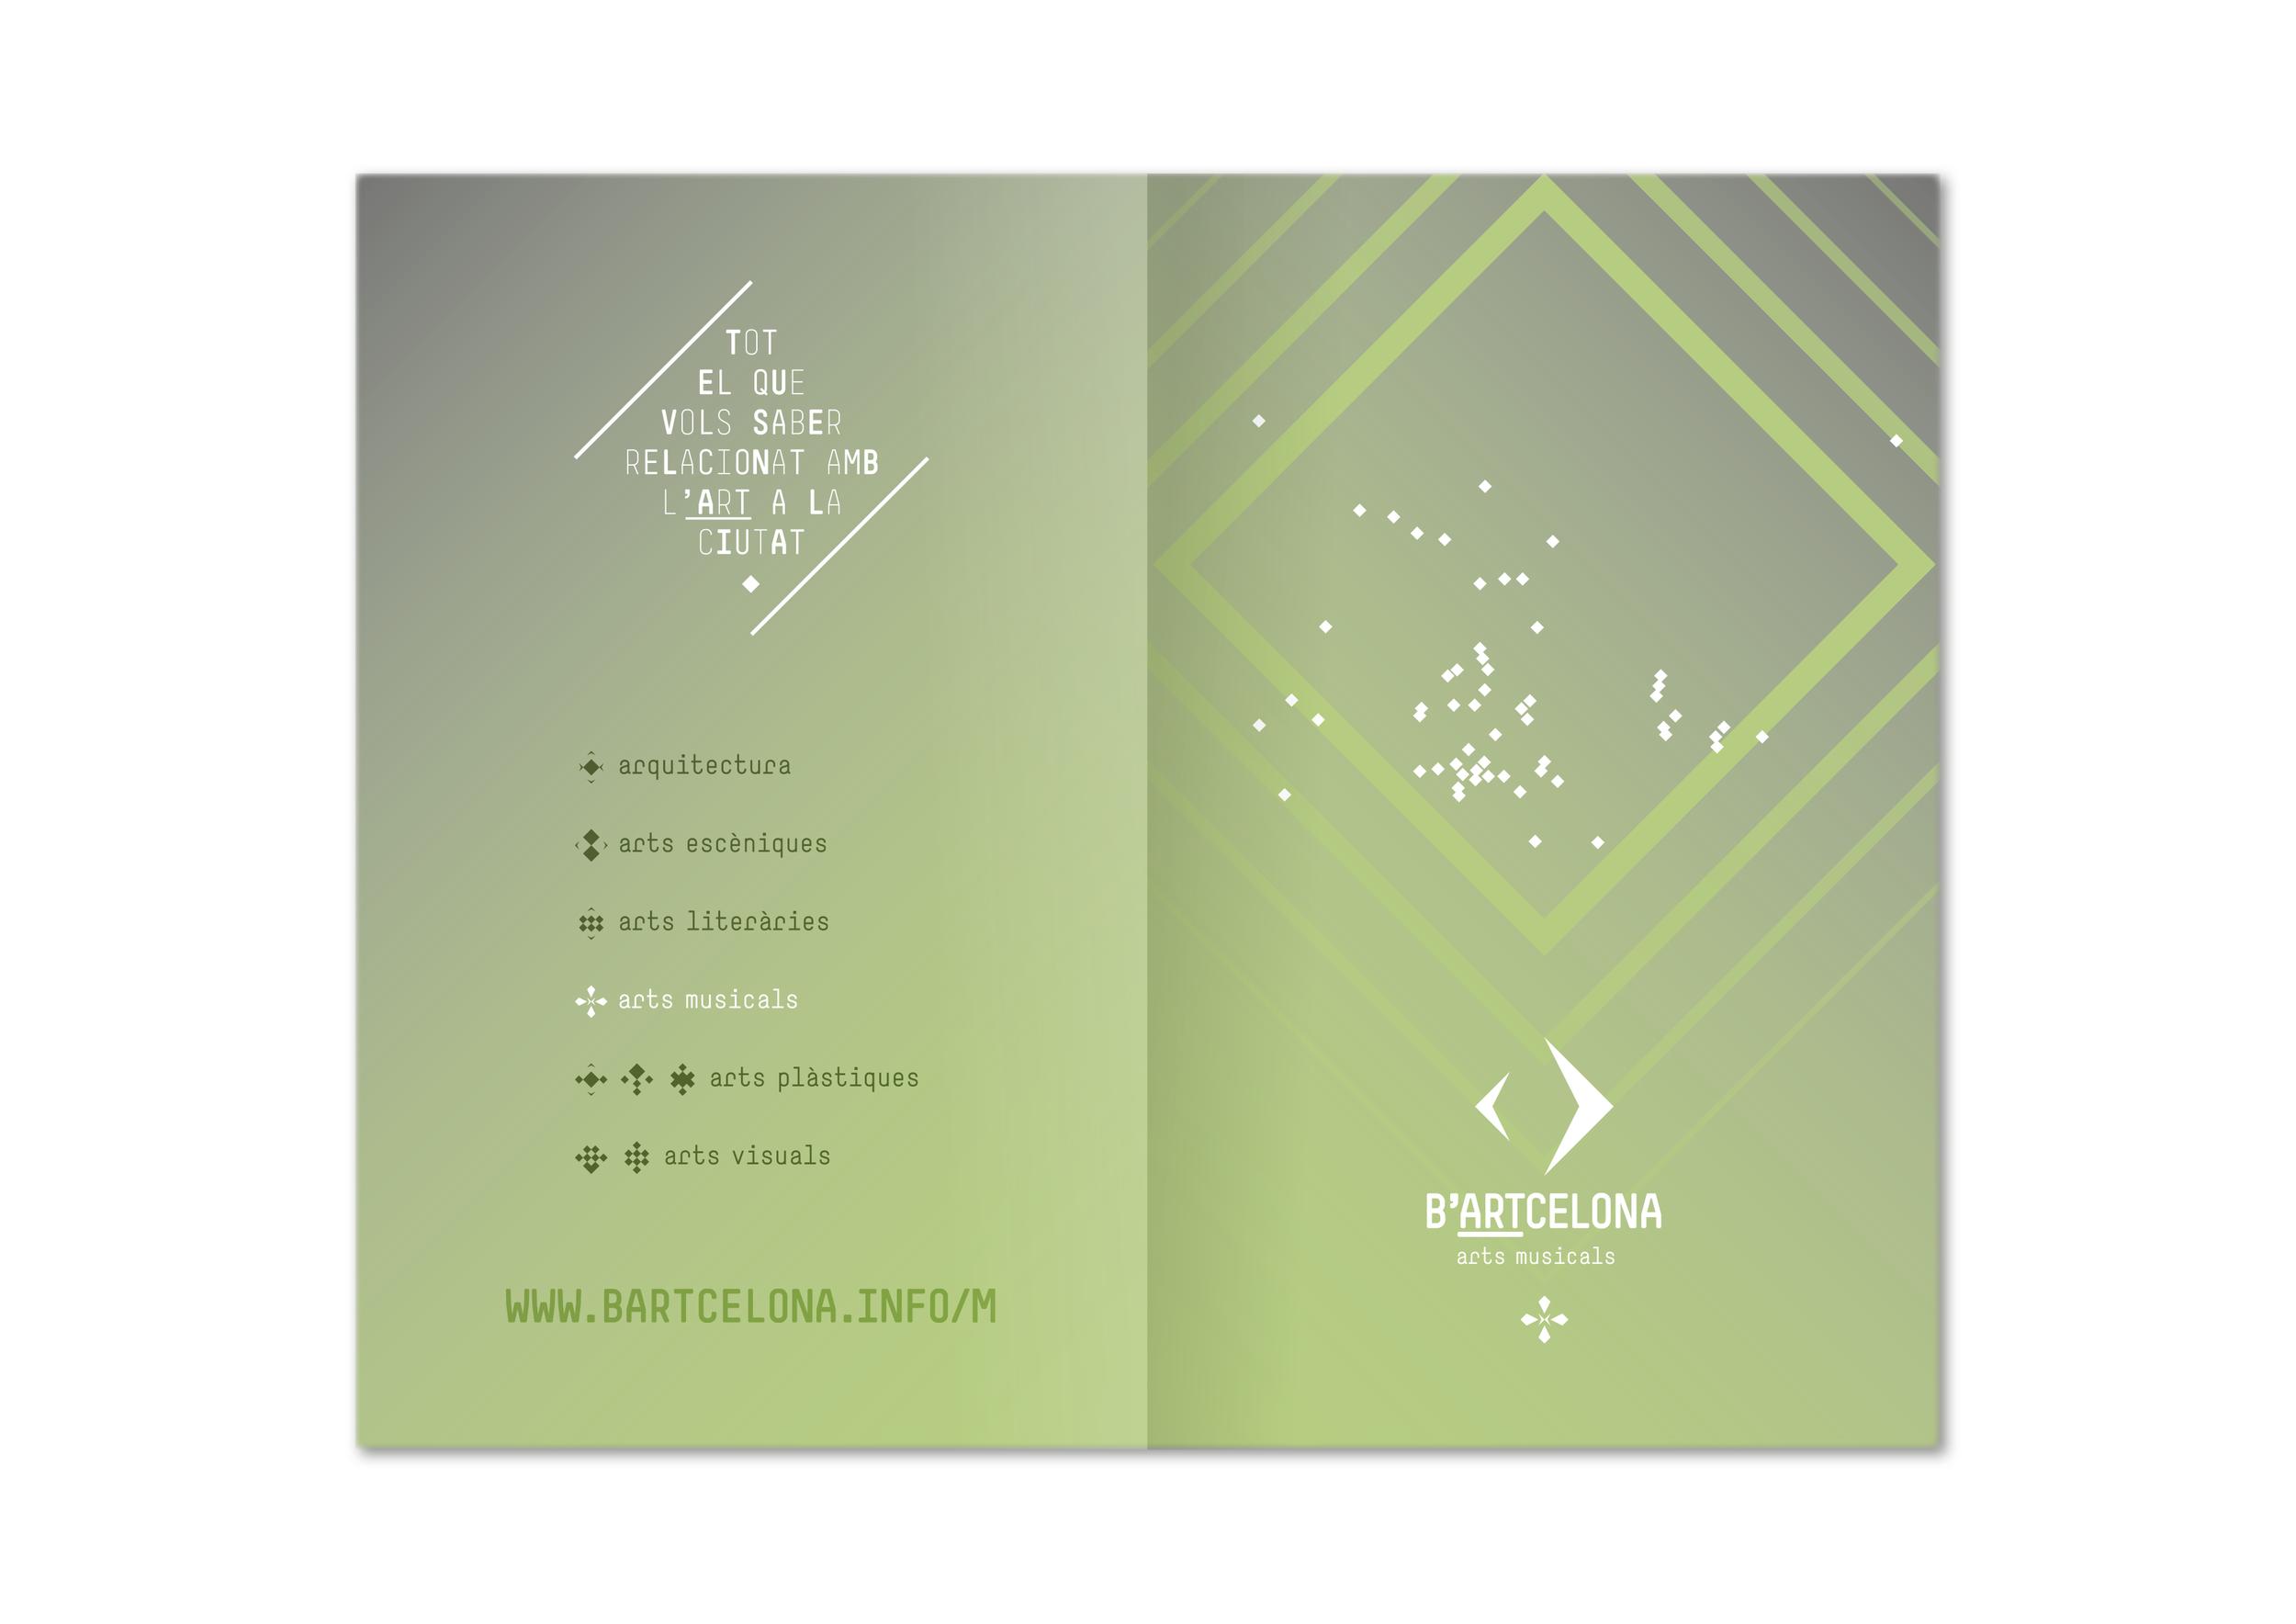 bartcelona_cover_bk4_victorgc.png